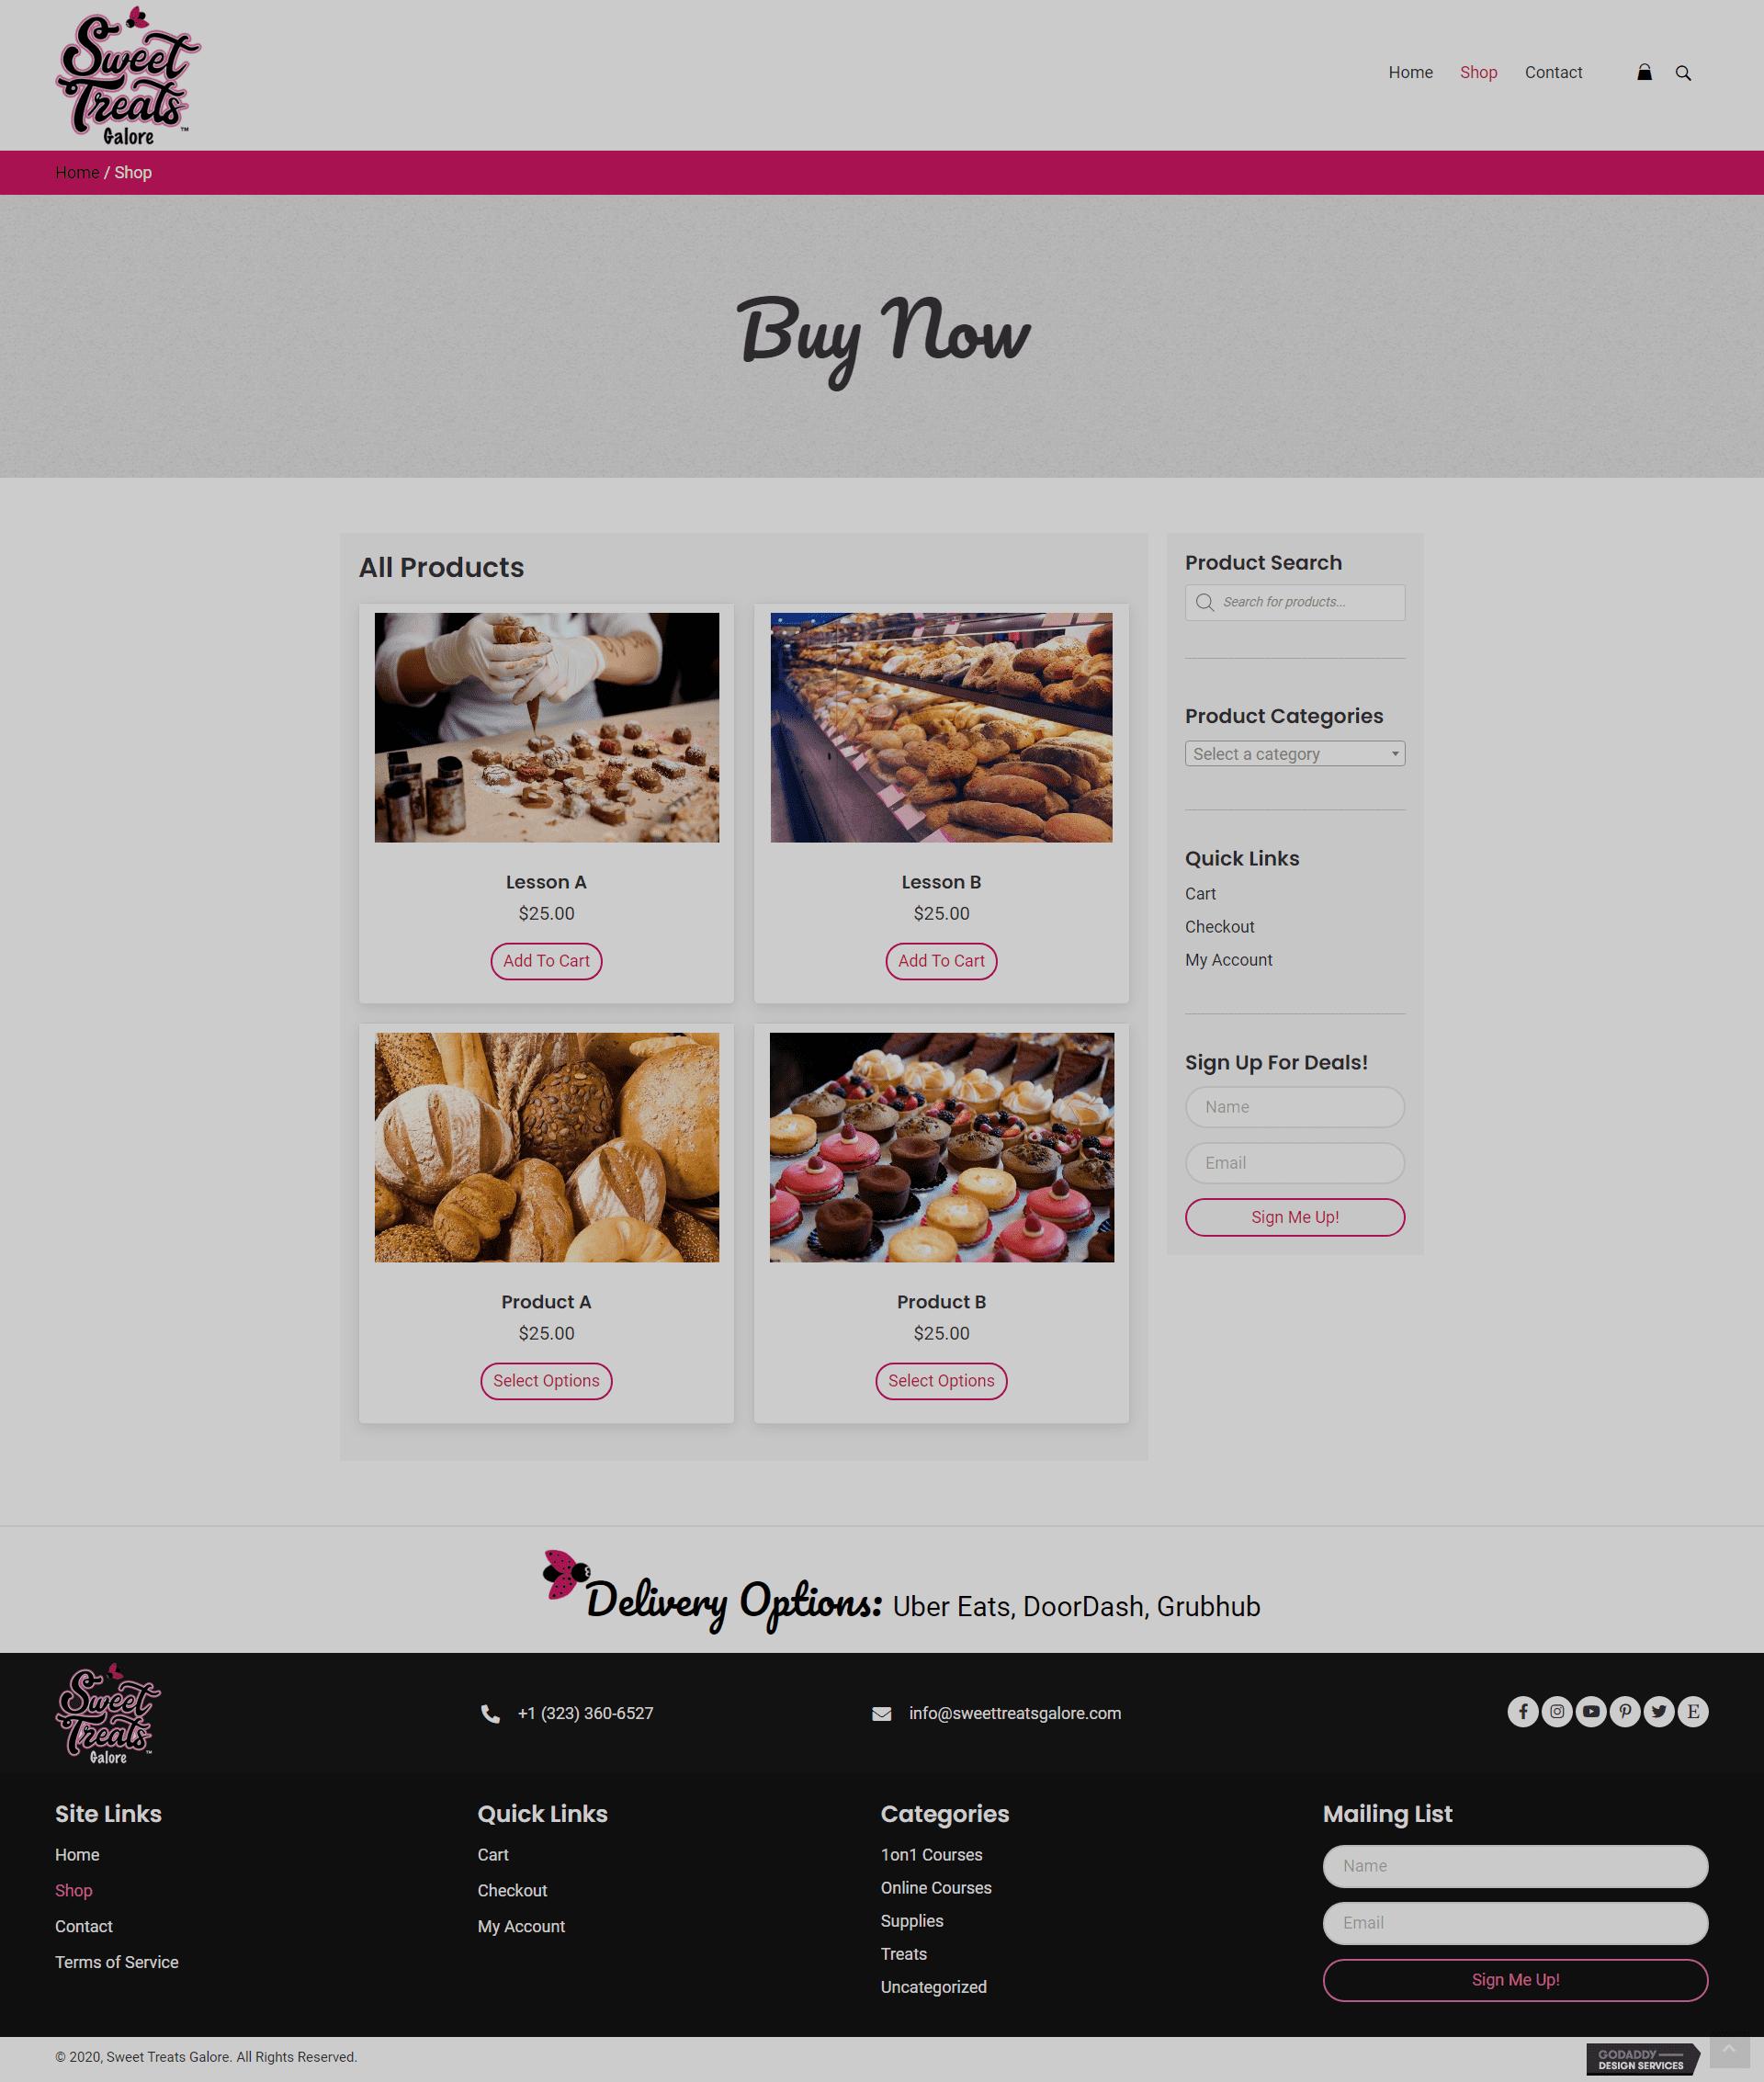 Sweet Treats Galore Shop Page